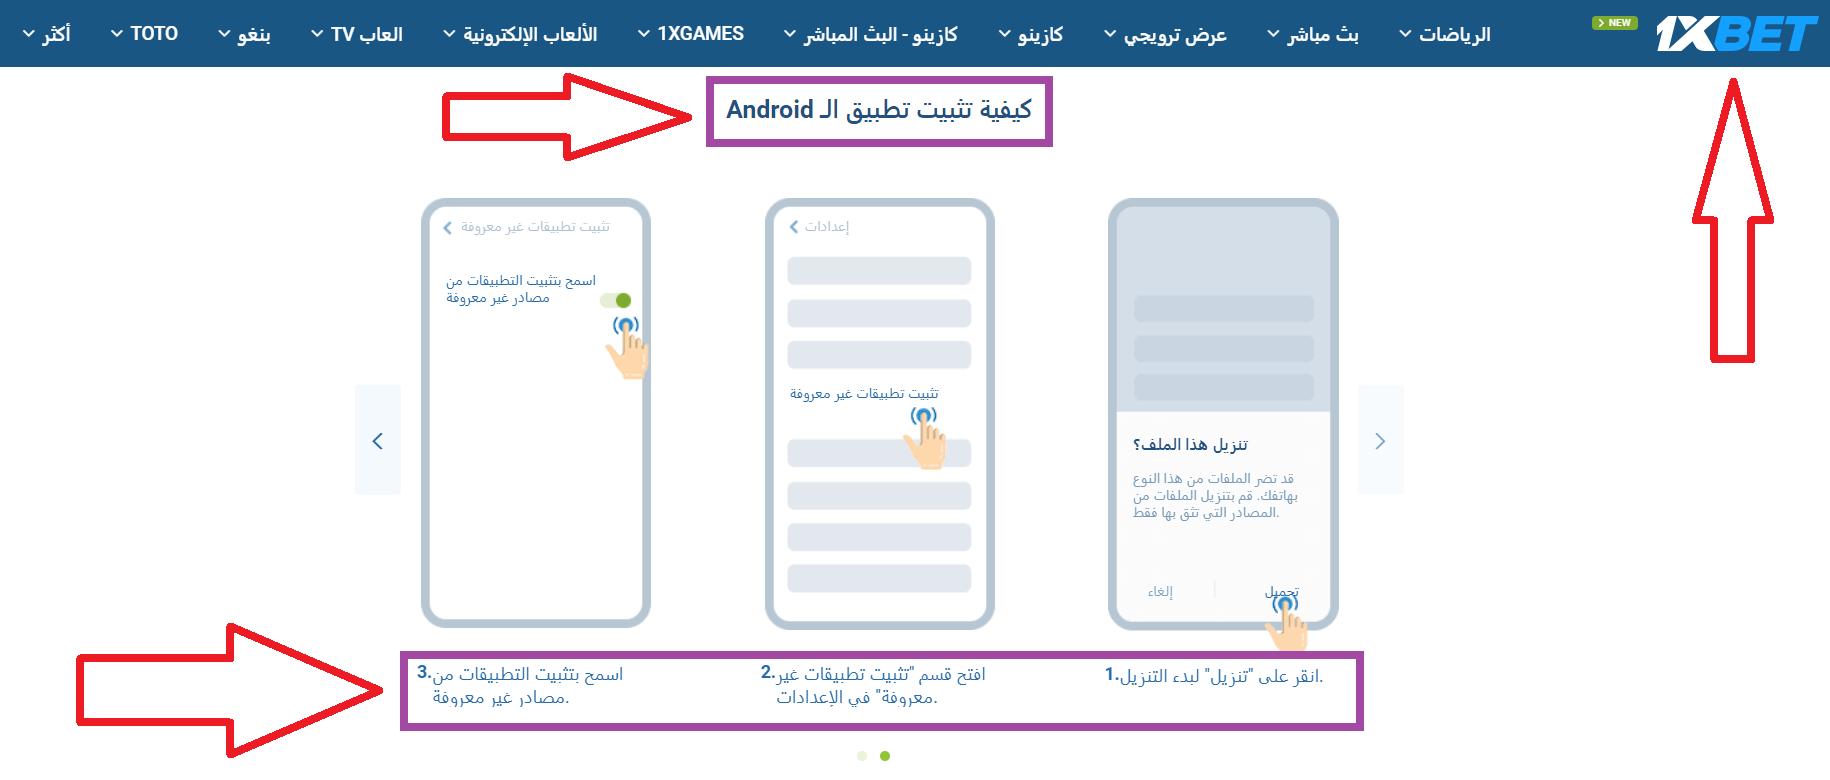 Android تطبيق للأجهزة على الموقع 1xBet